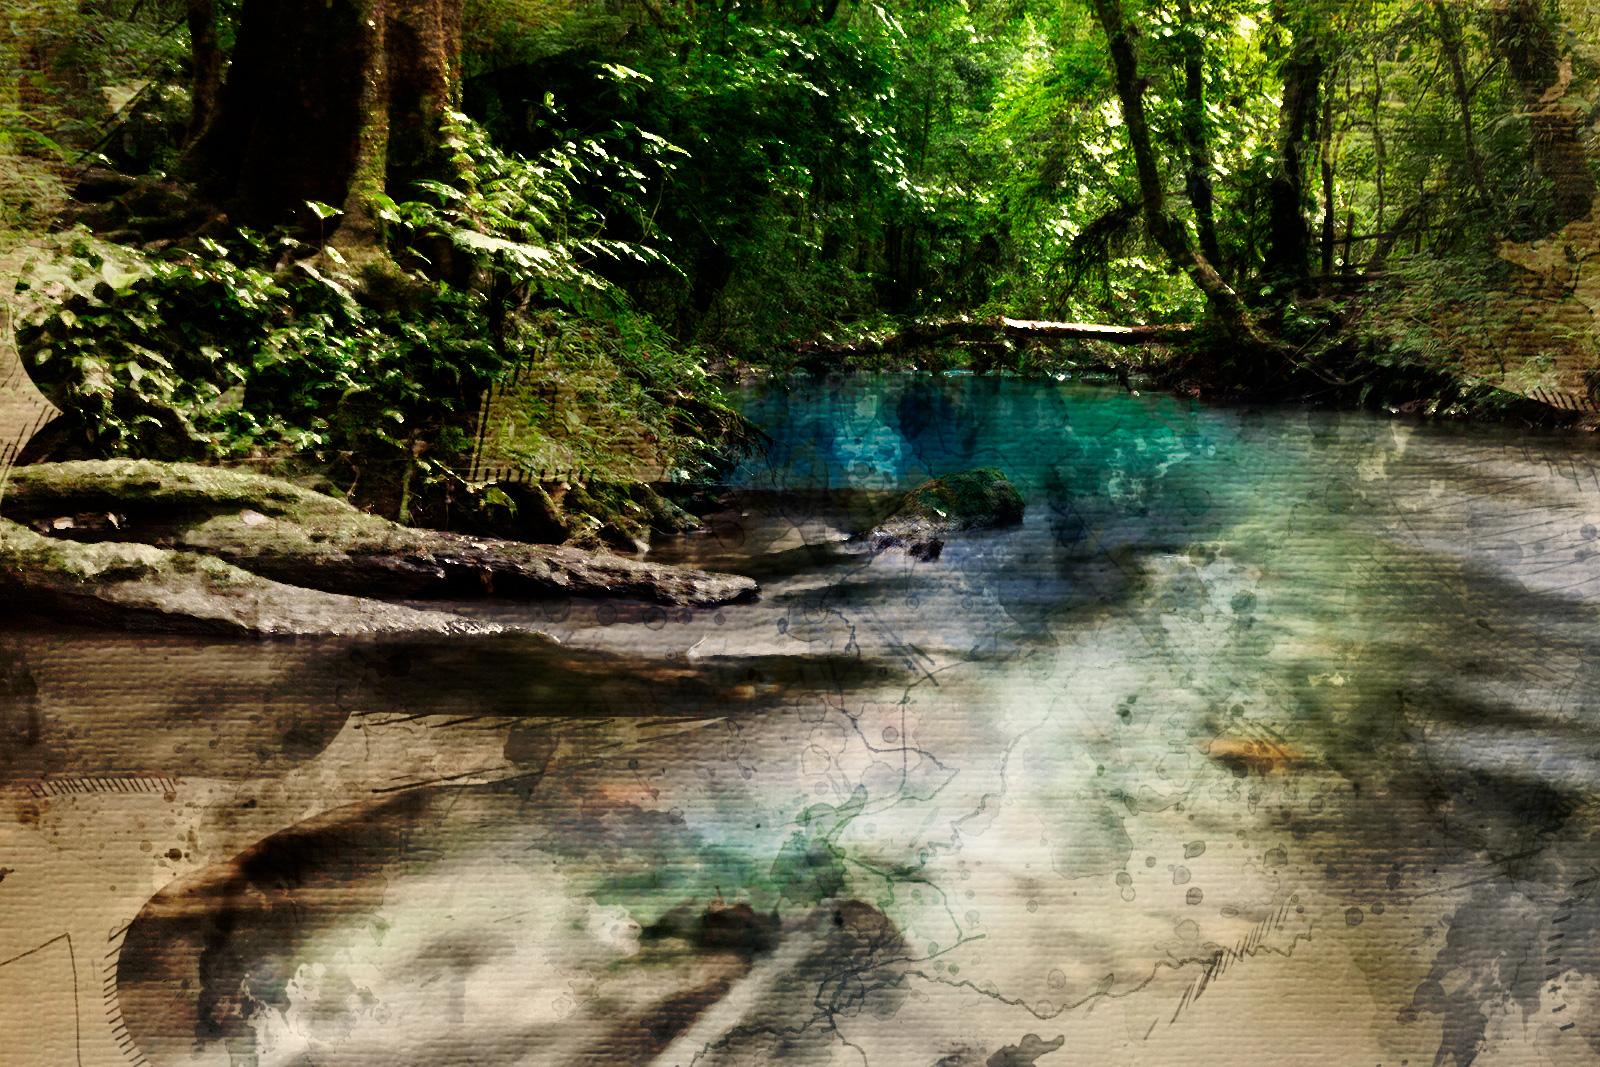 Guía de Viajes a Costa Rica OK MARA